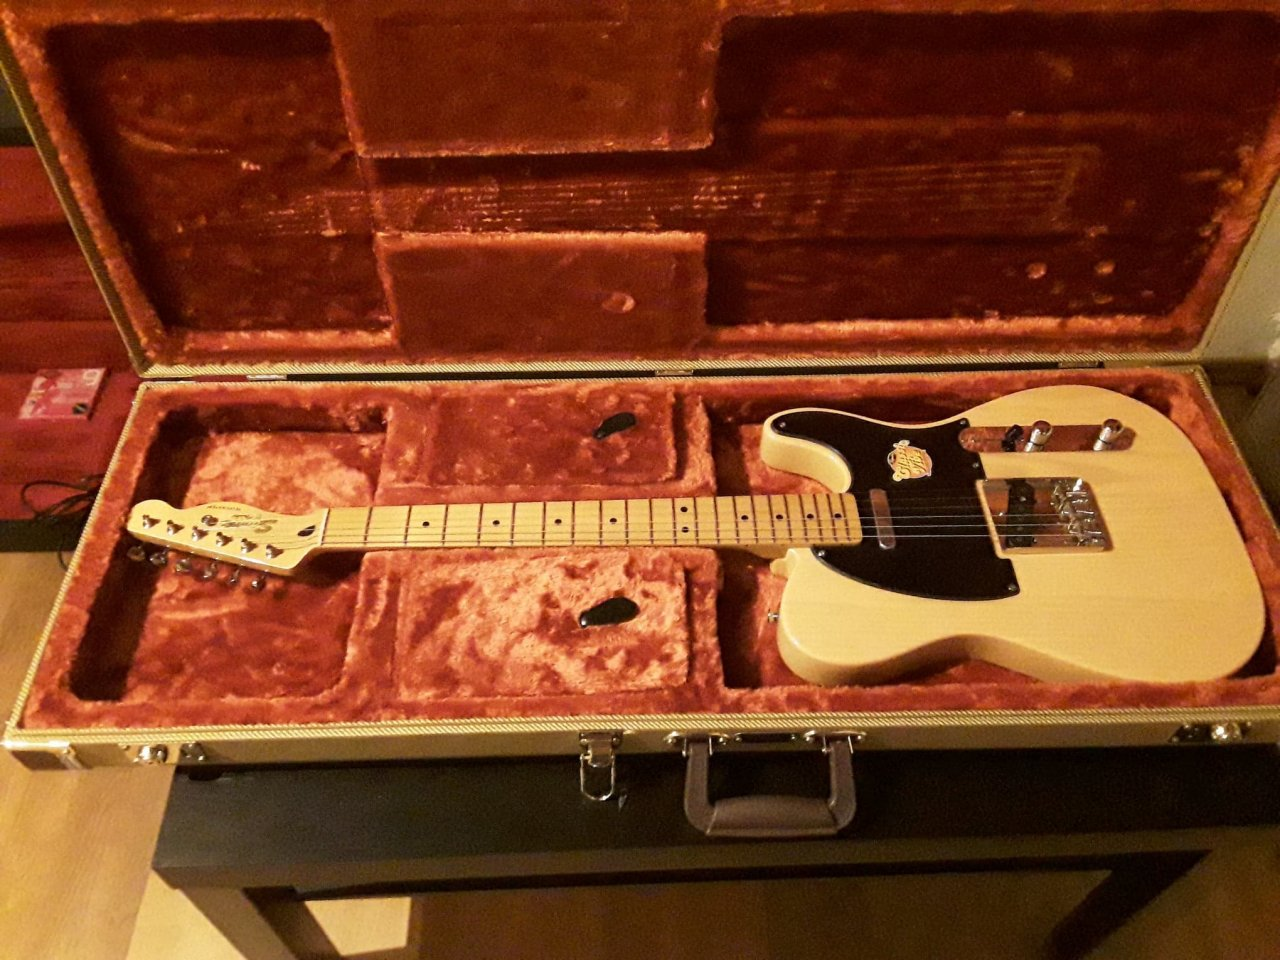 Fender Squier Classic Vibe 50's Telecaster-001.jpg